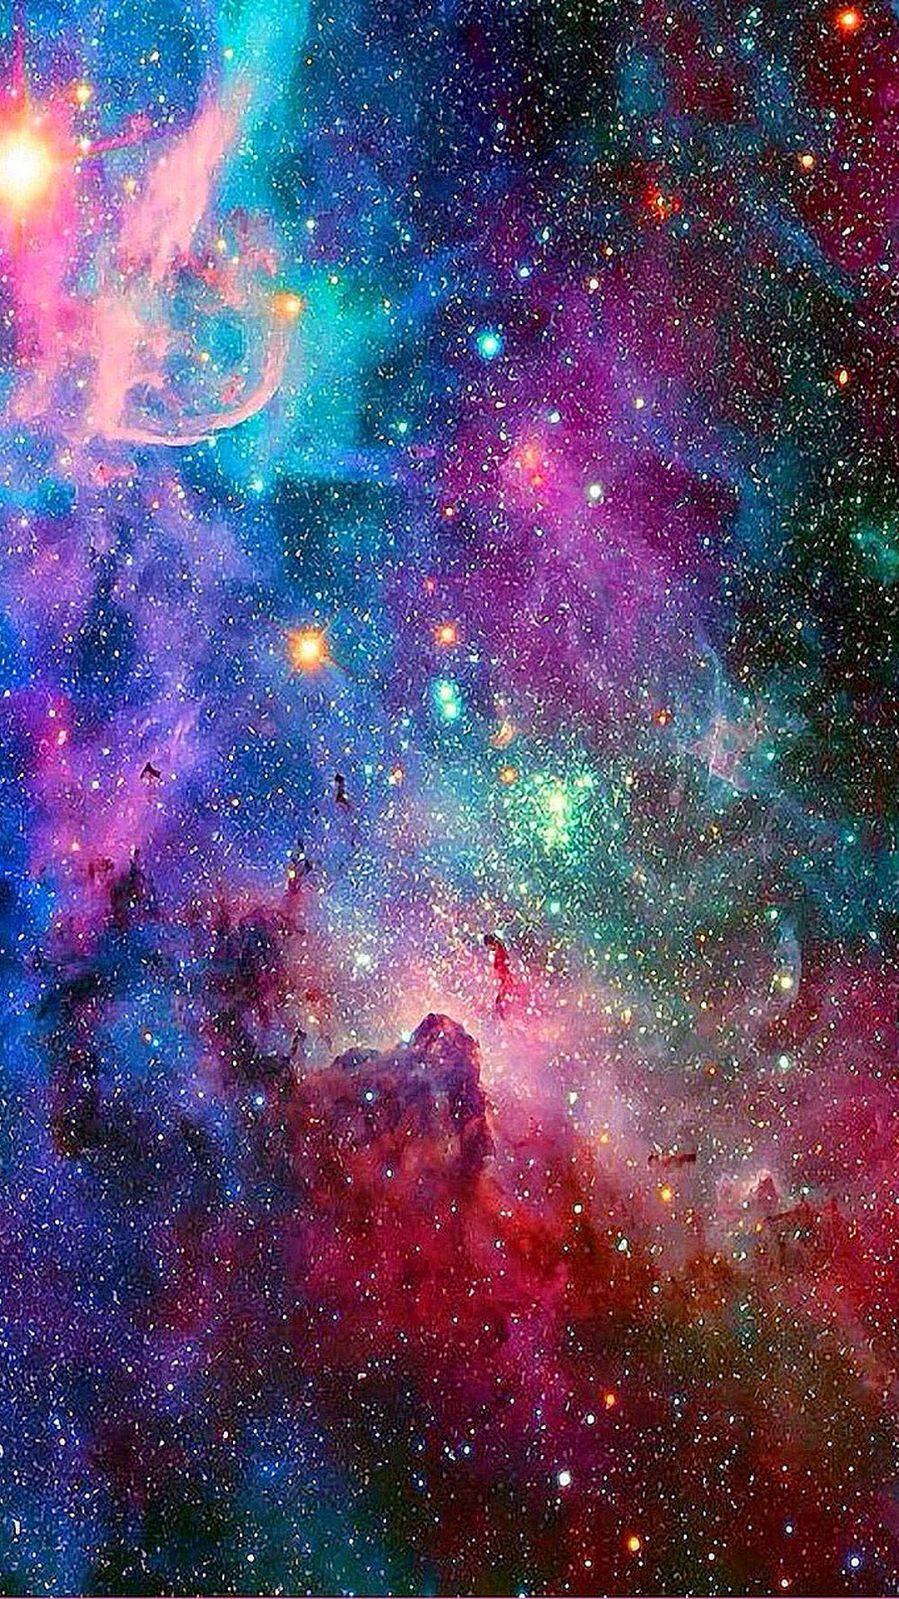 Galaxy Colorfull Univers Light Star Sky Wallpaper Colorful Galaxy Wallpaper Hd 899x1599 Wallpaper Teahub Io